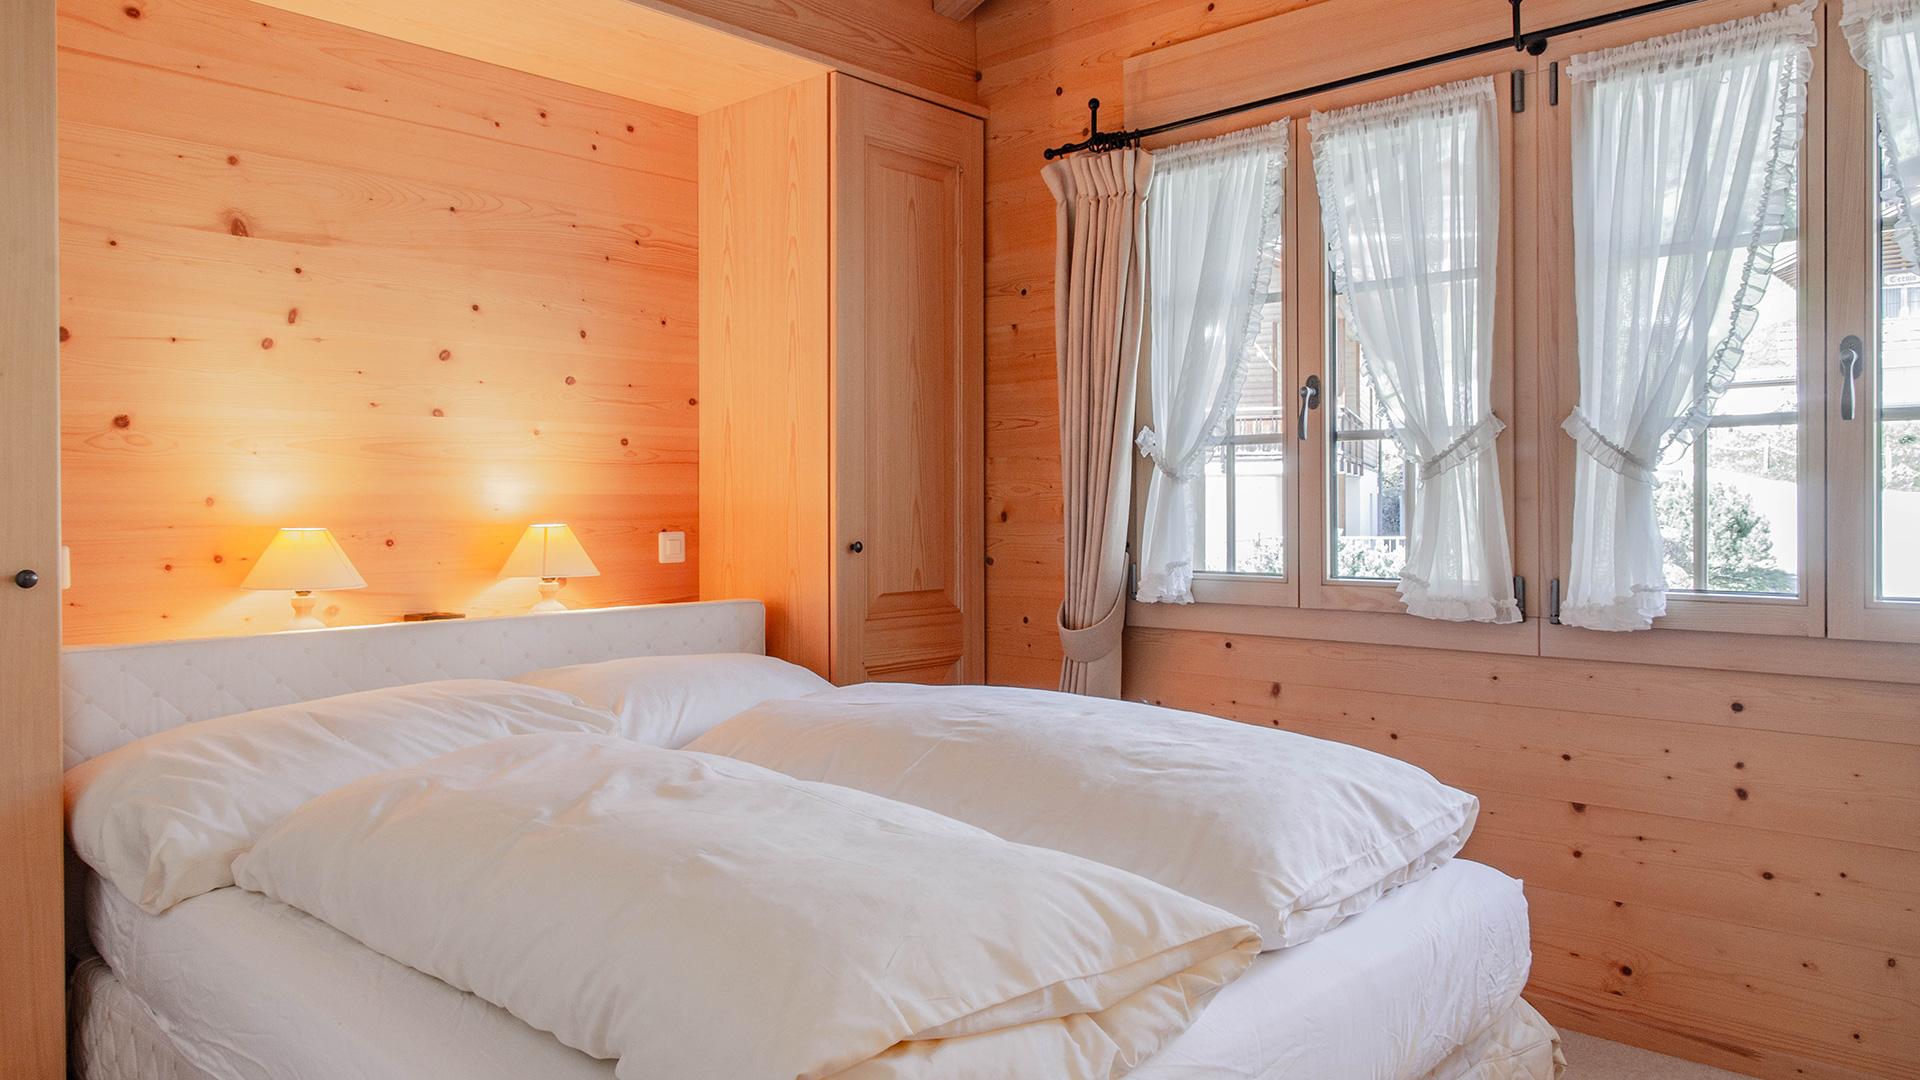 Mozart Penthouse Apartments, Switzerland